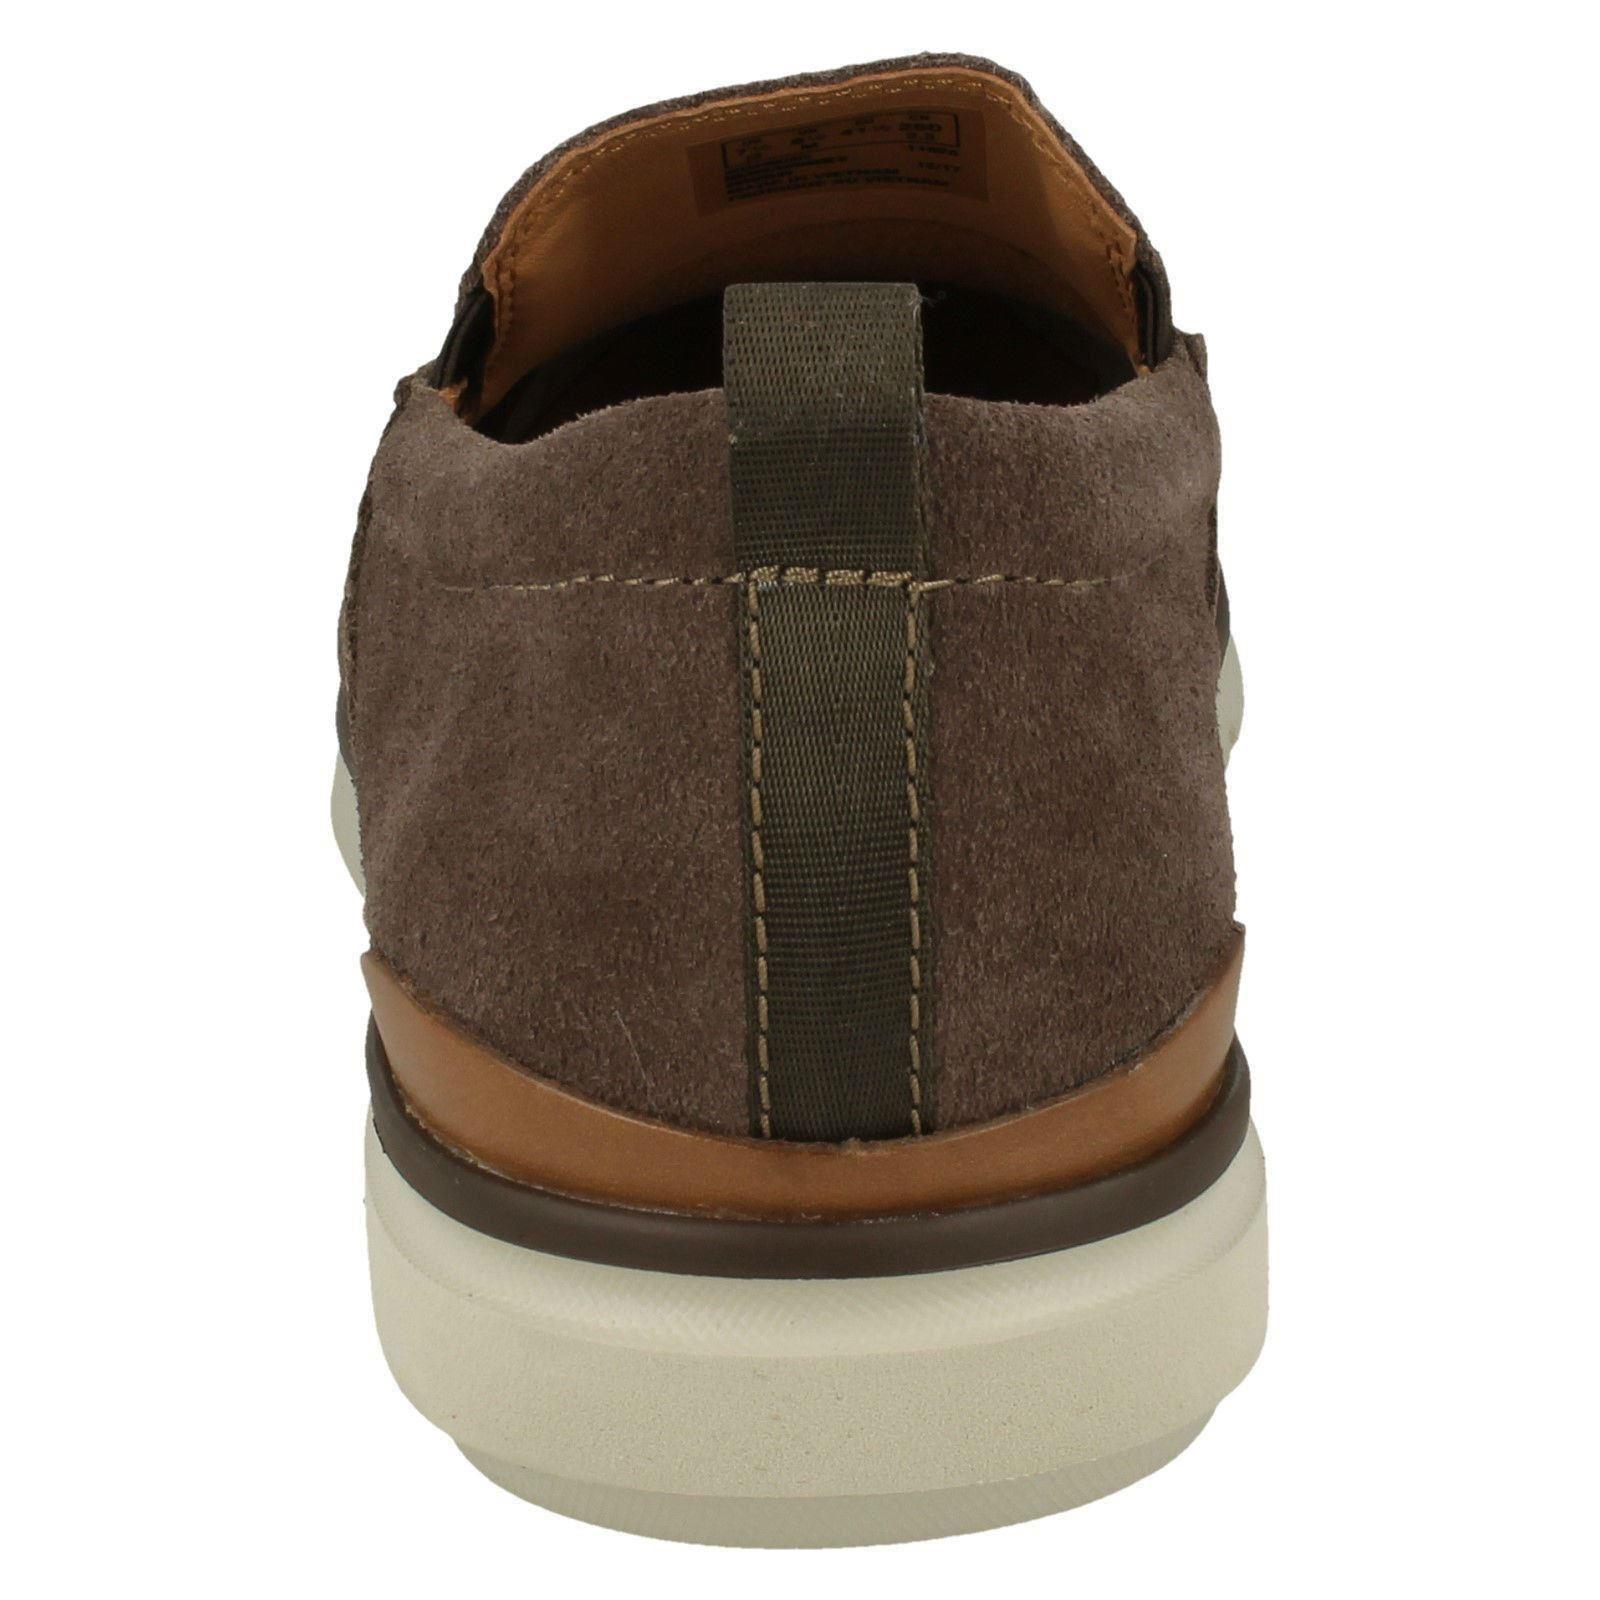 Cordones Hombre Casuales Edgewood Step Sin Clarks Zapatos PwSqgZfS7